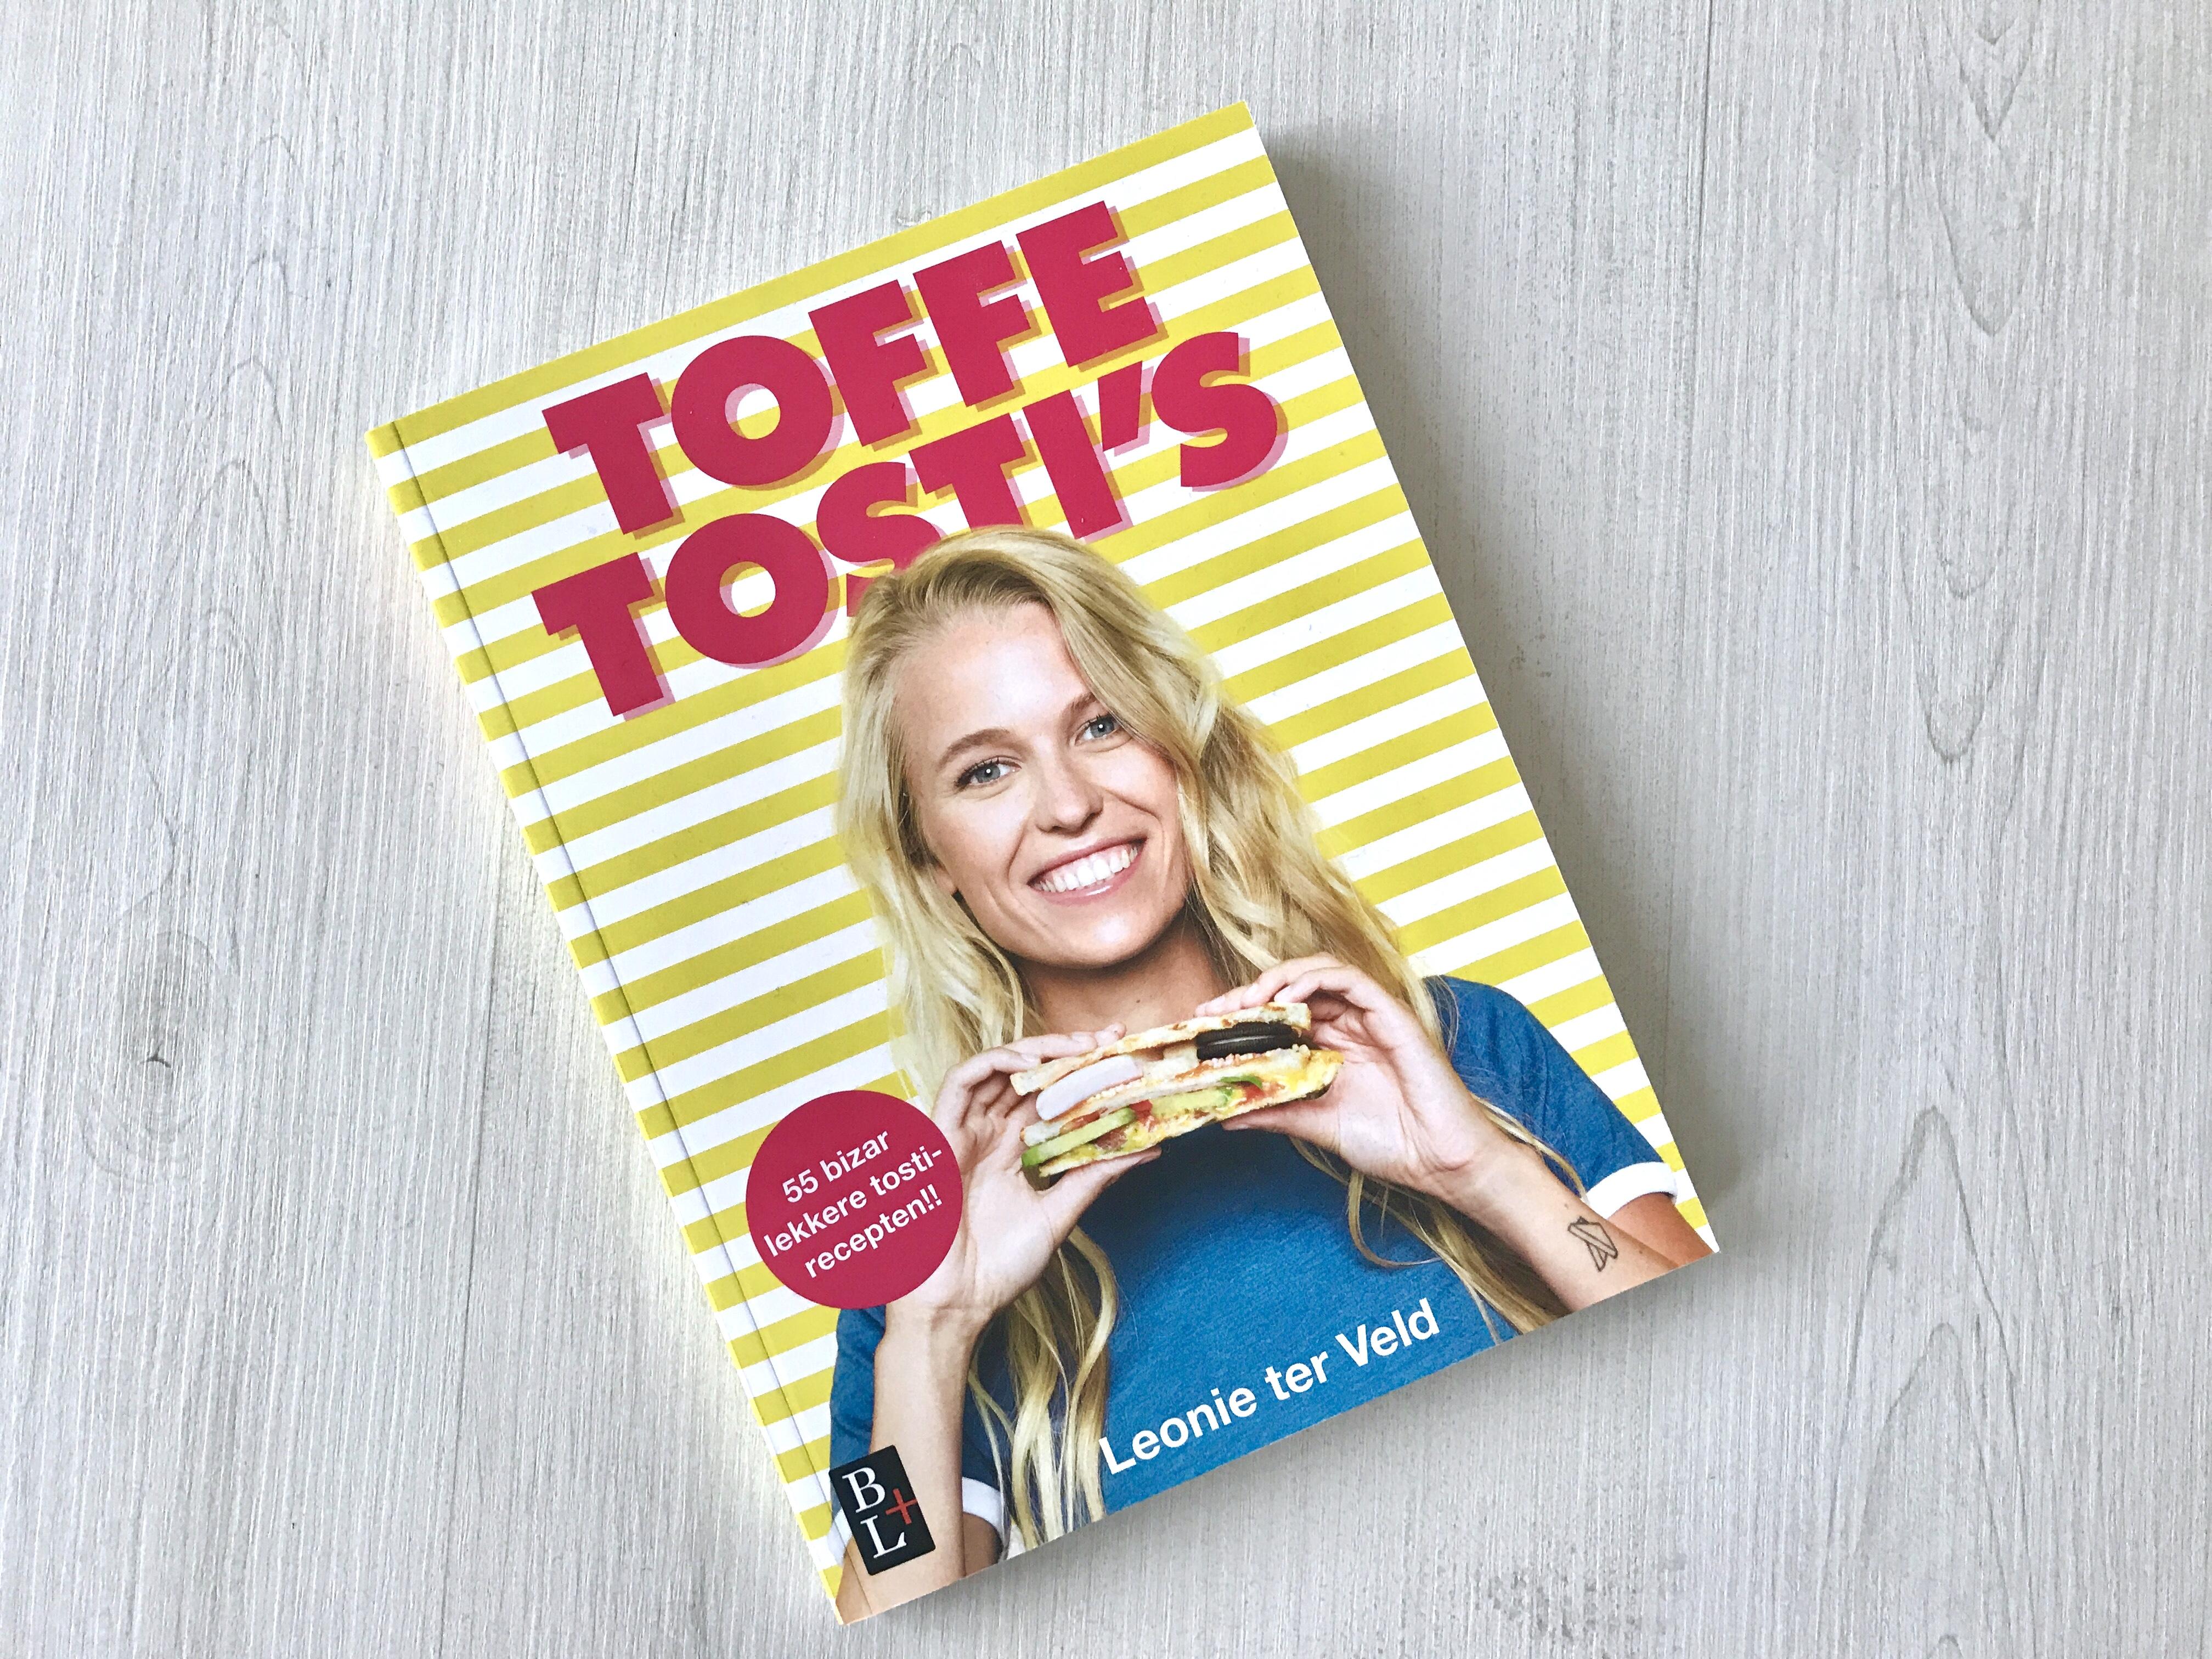 Toffe Tosti